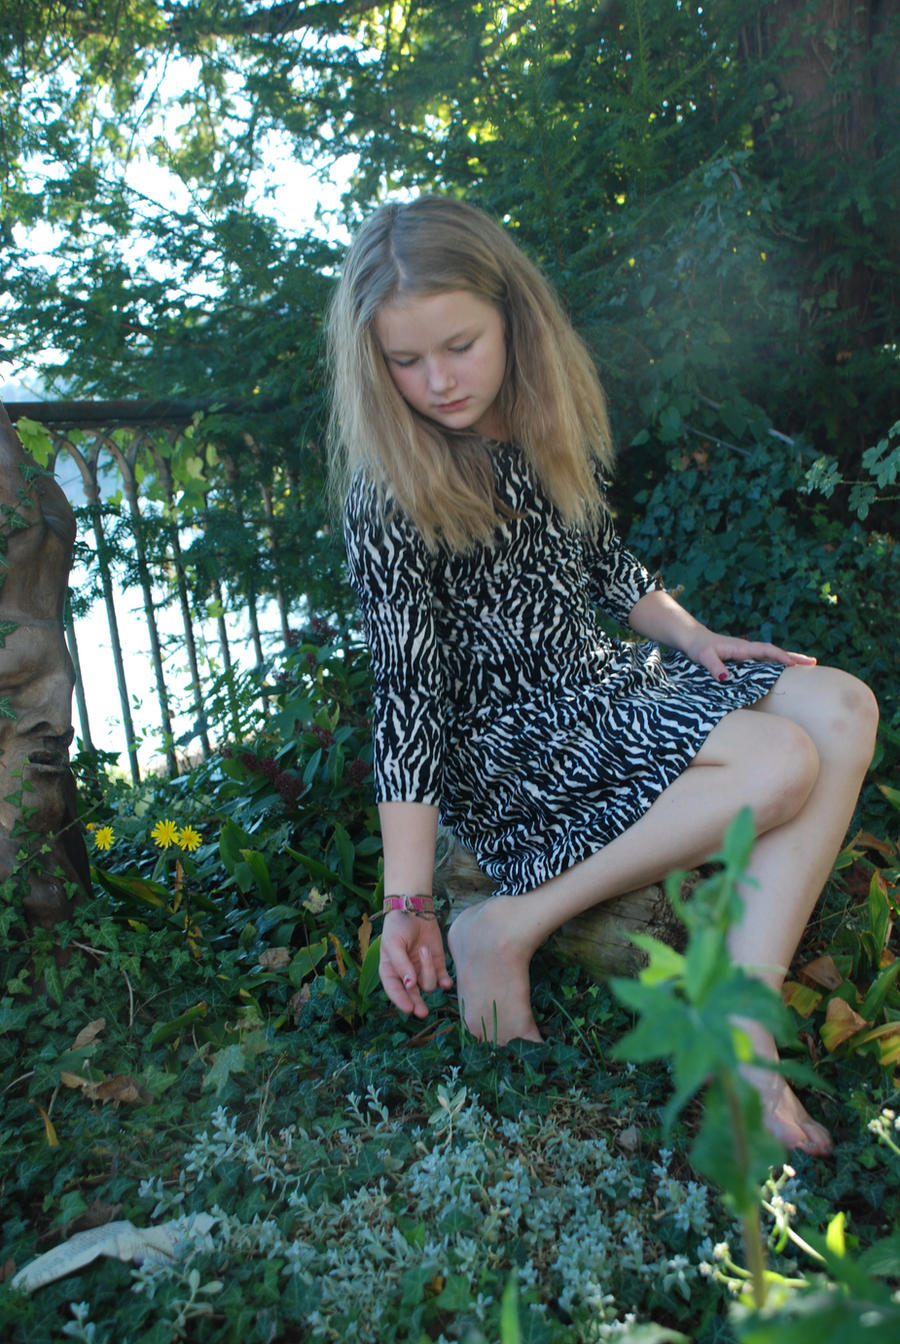 Girl Stock 9 by BirdsistersStock